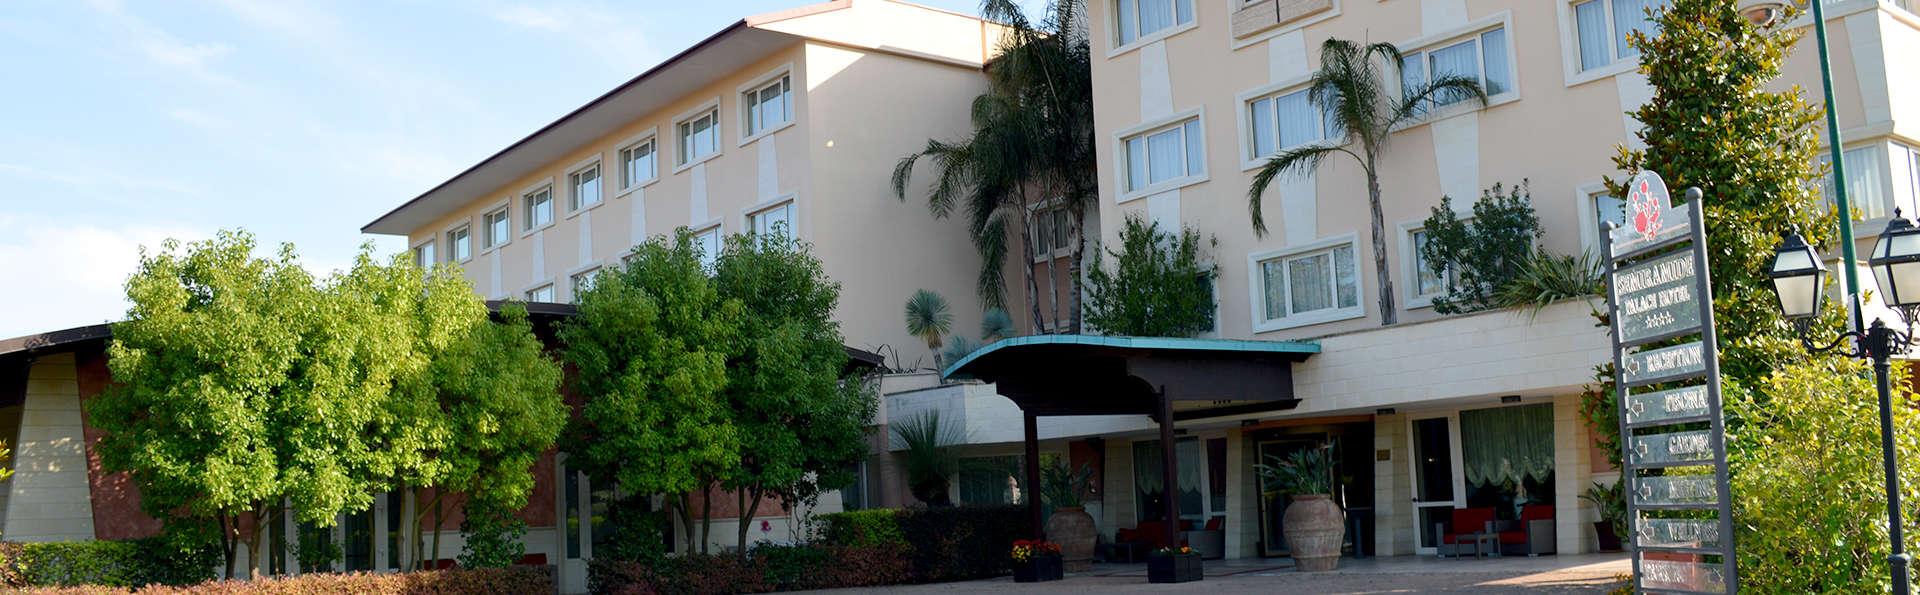 Semiramide Palace Hotel  - Edit_Front3.jpg